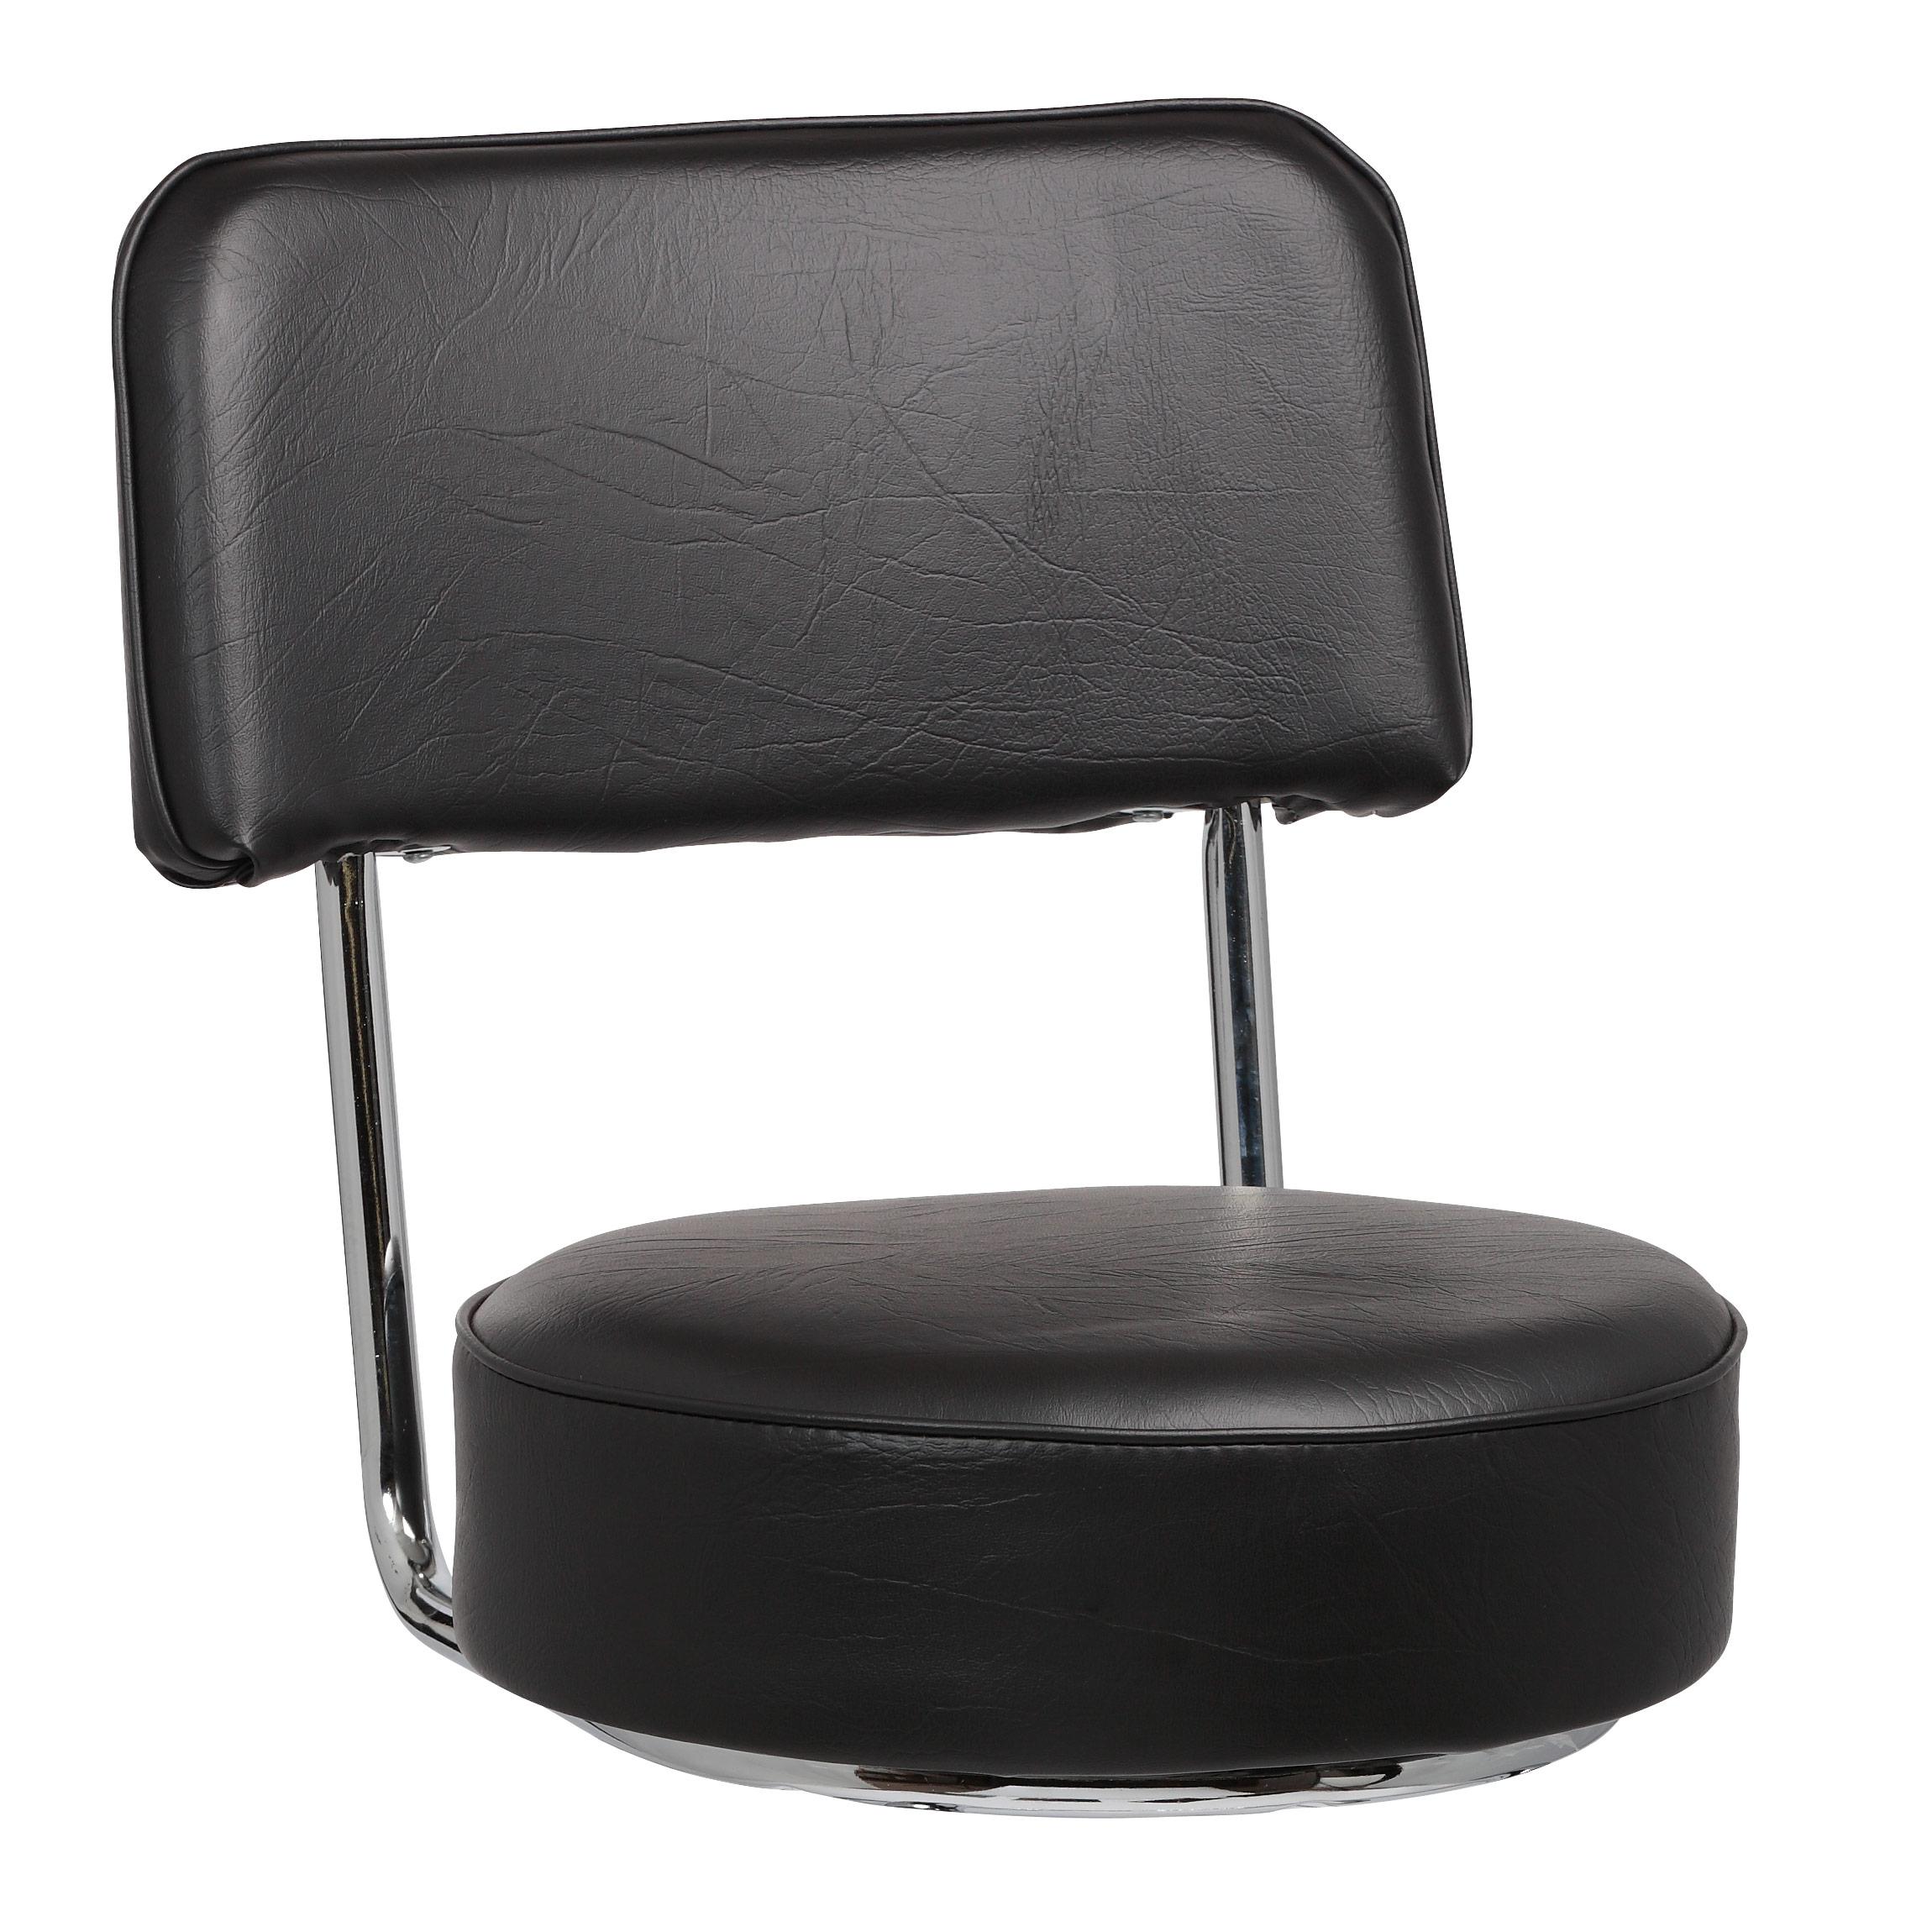 Royal Industries ROY 7715 SB chair / bar stool seat